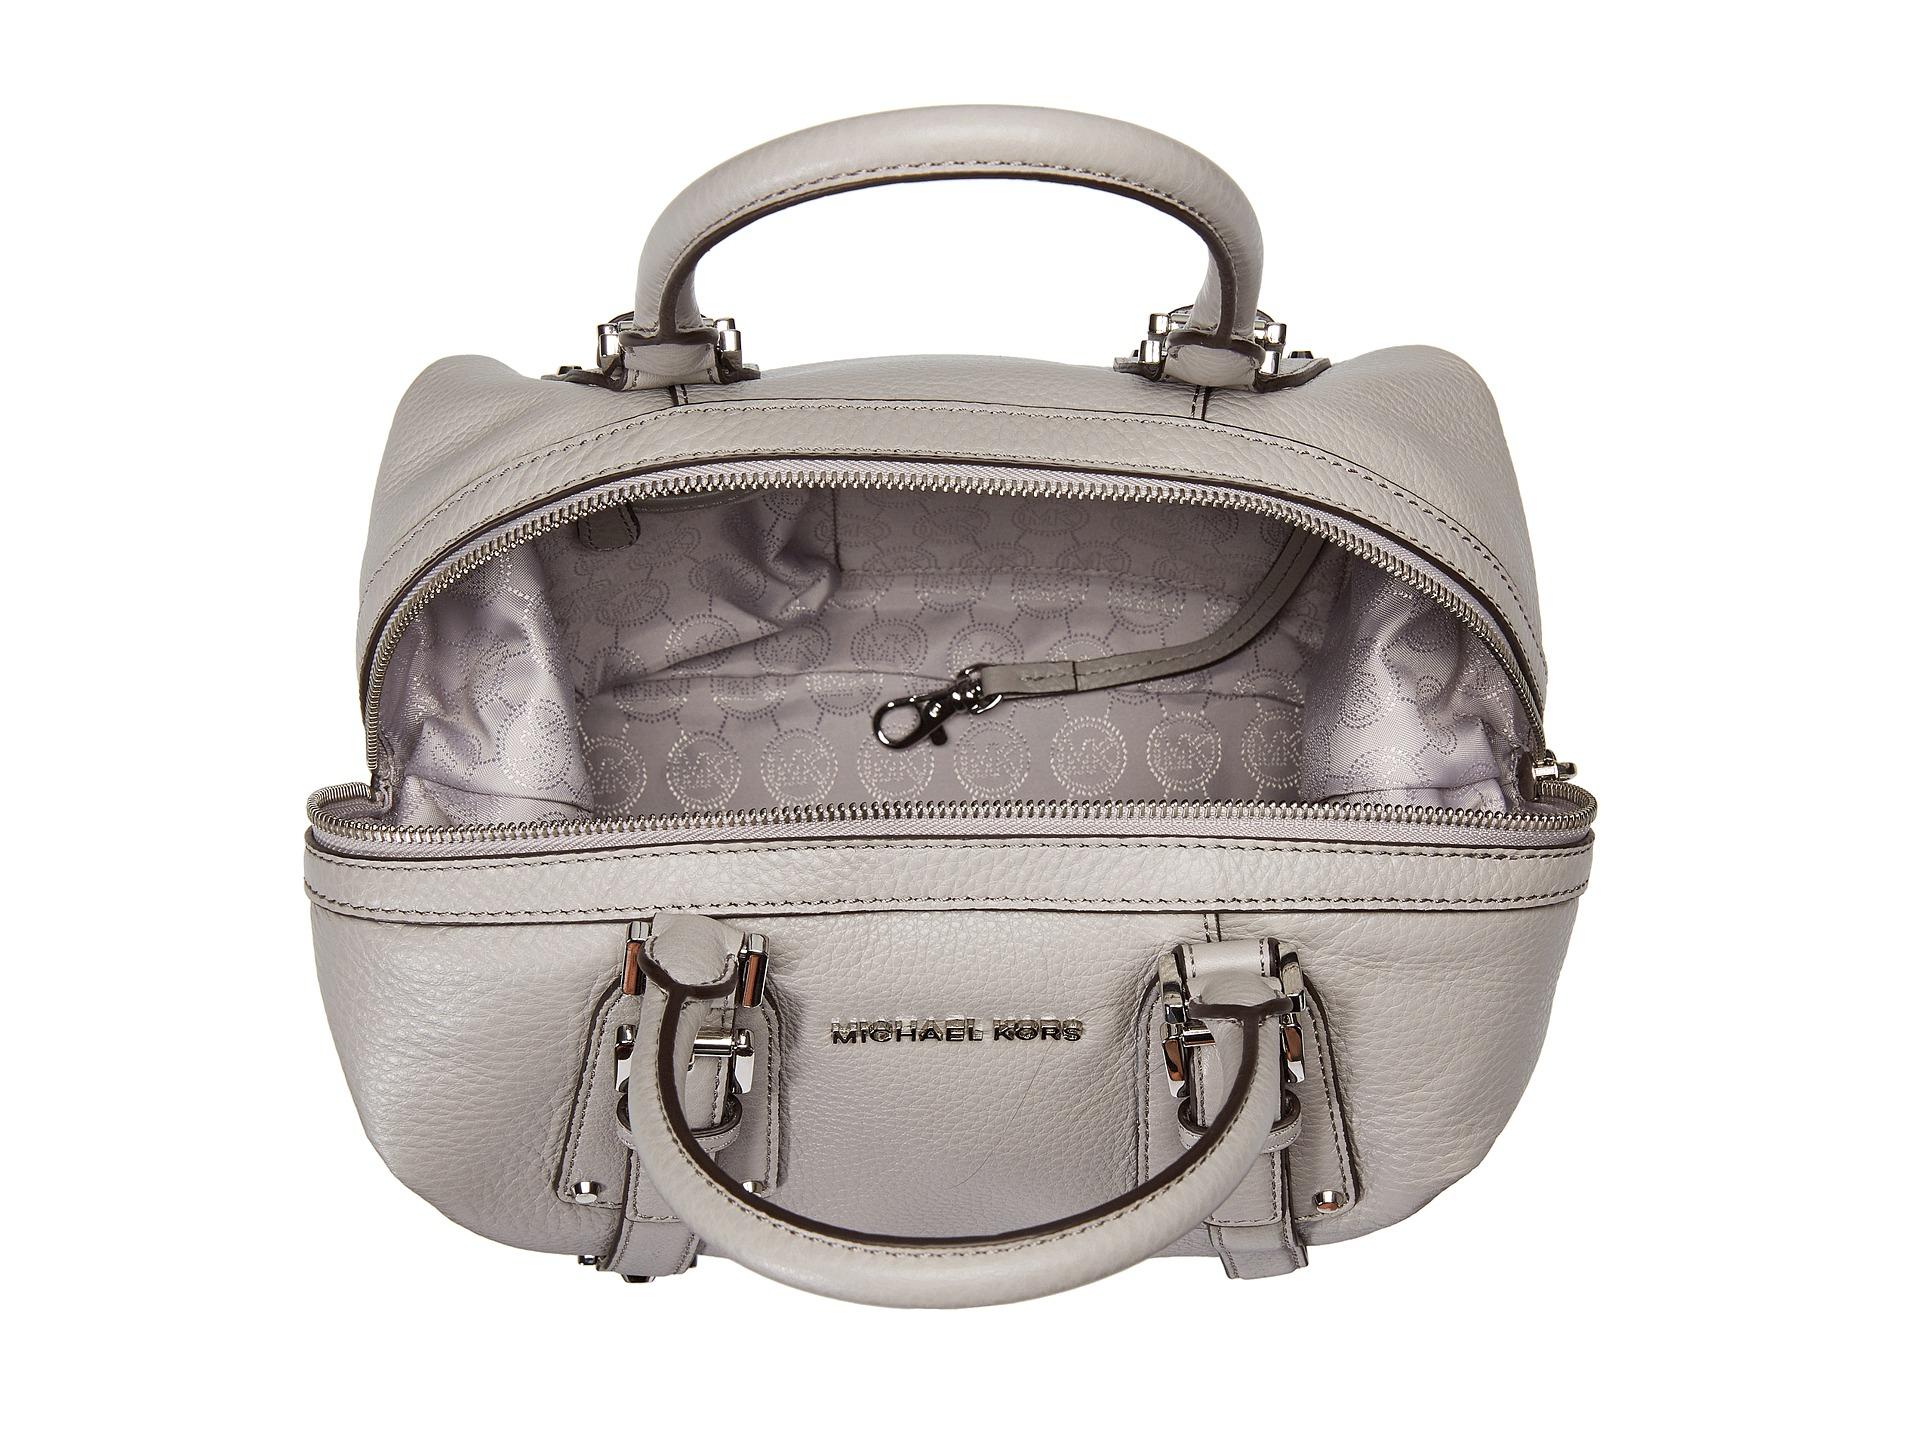 9a98bdb2b355 ... order lyst michael michael kors bedford belted medium satchel in gray  3ed0b 43498 ...